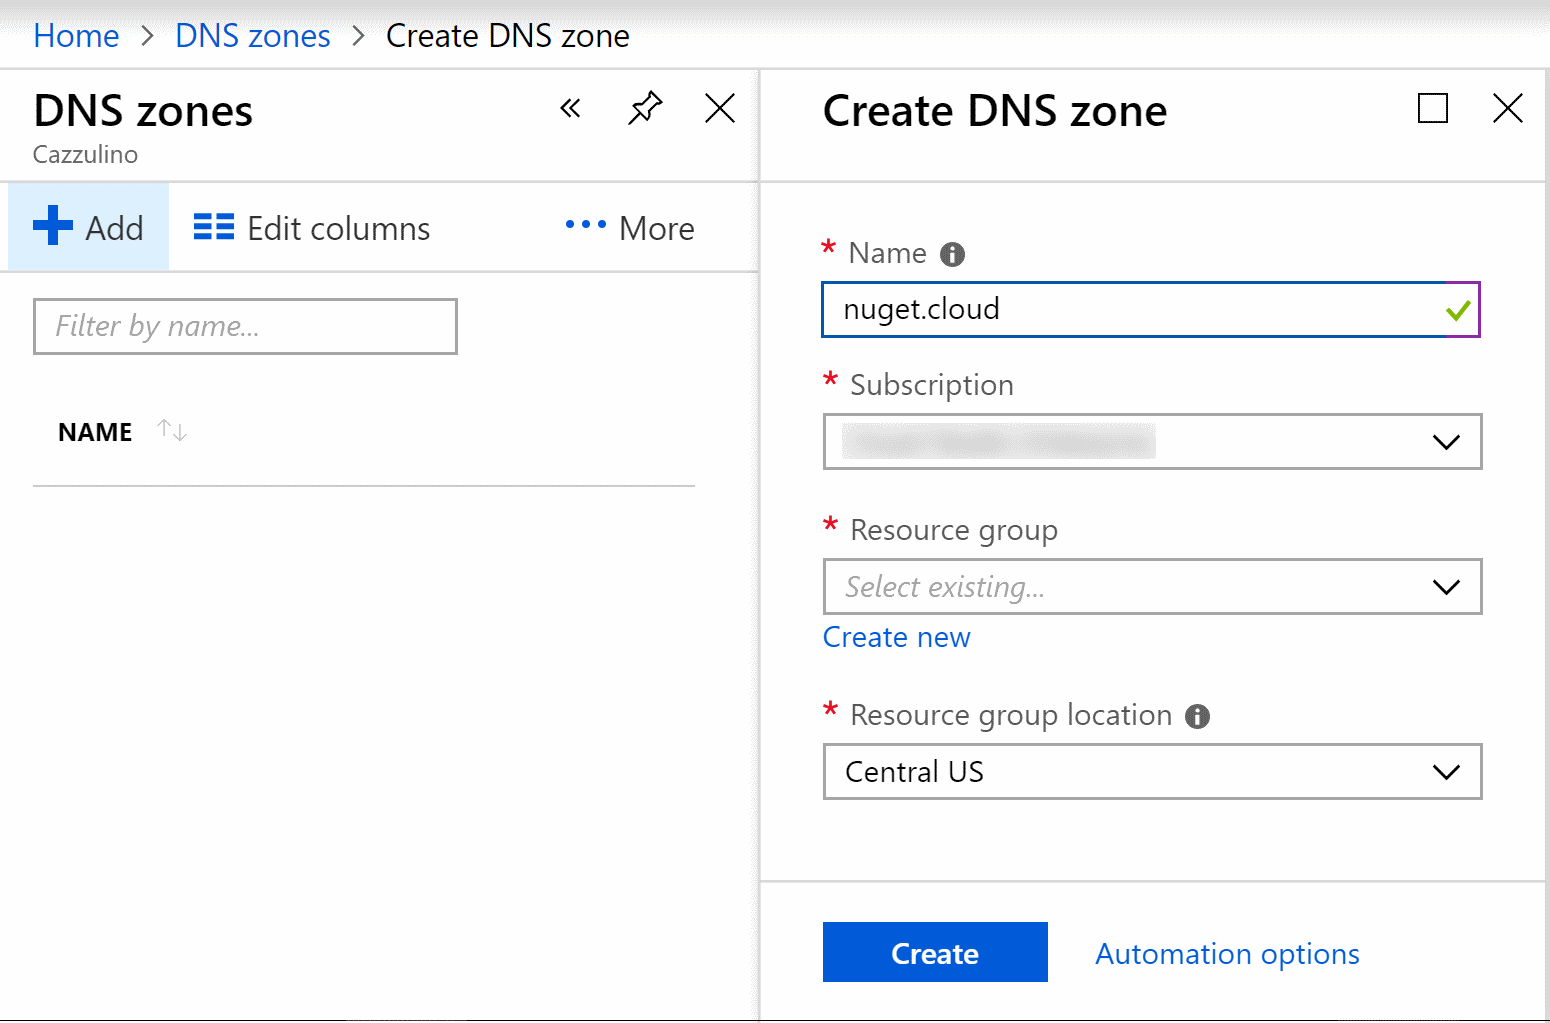 create DNS zone